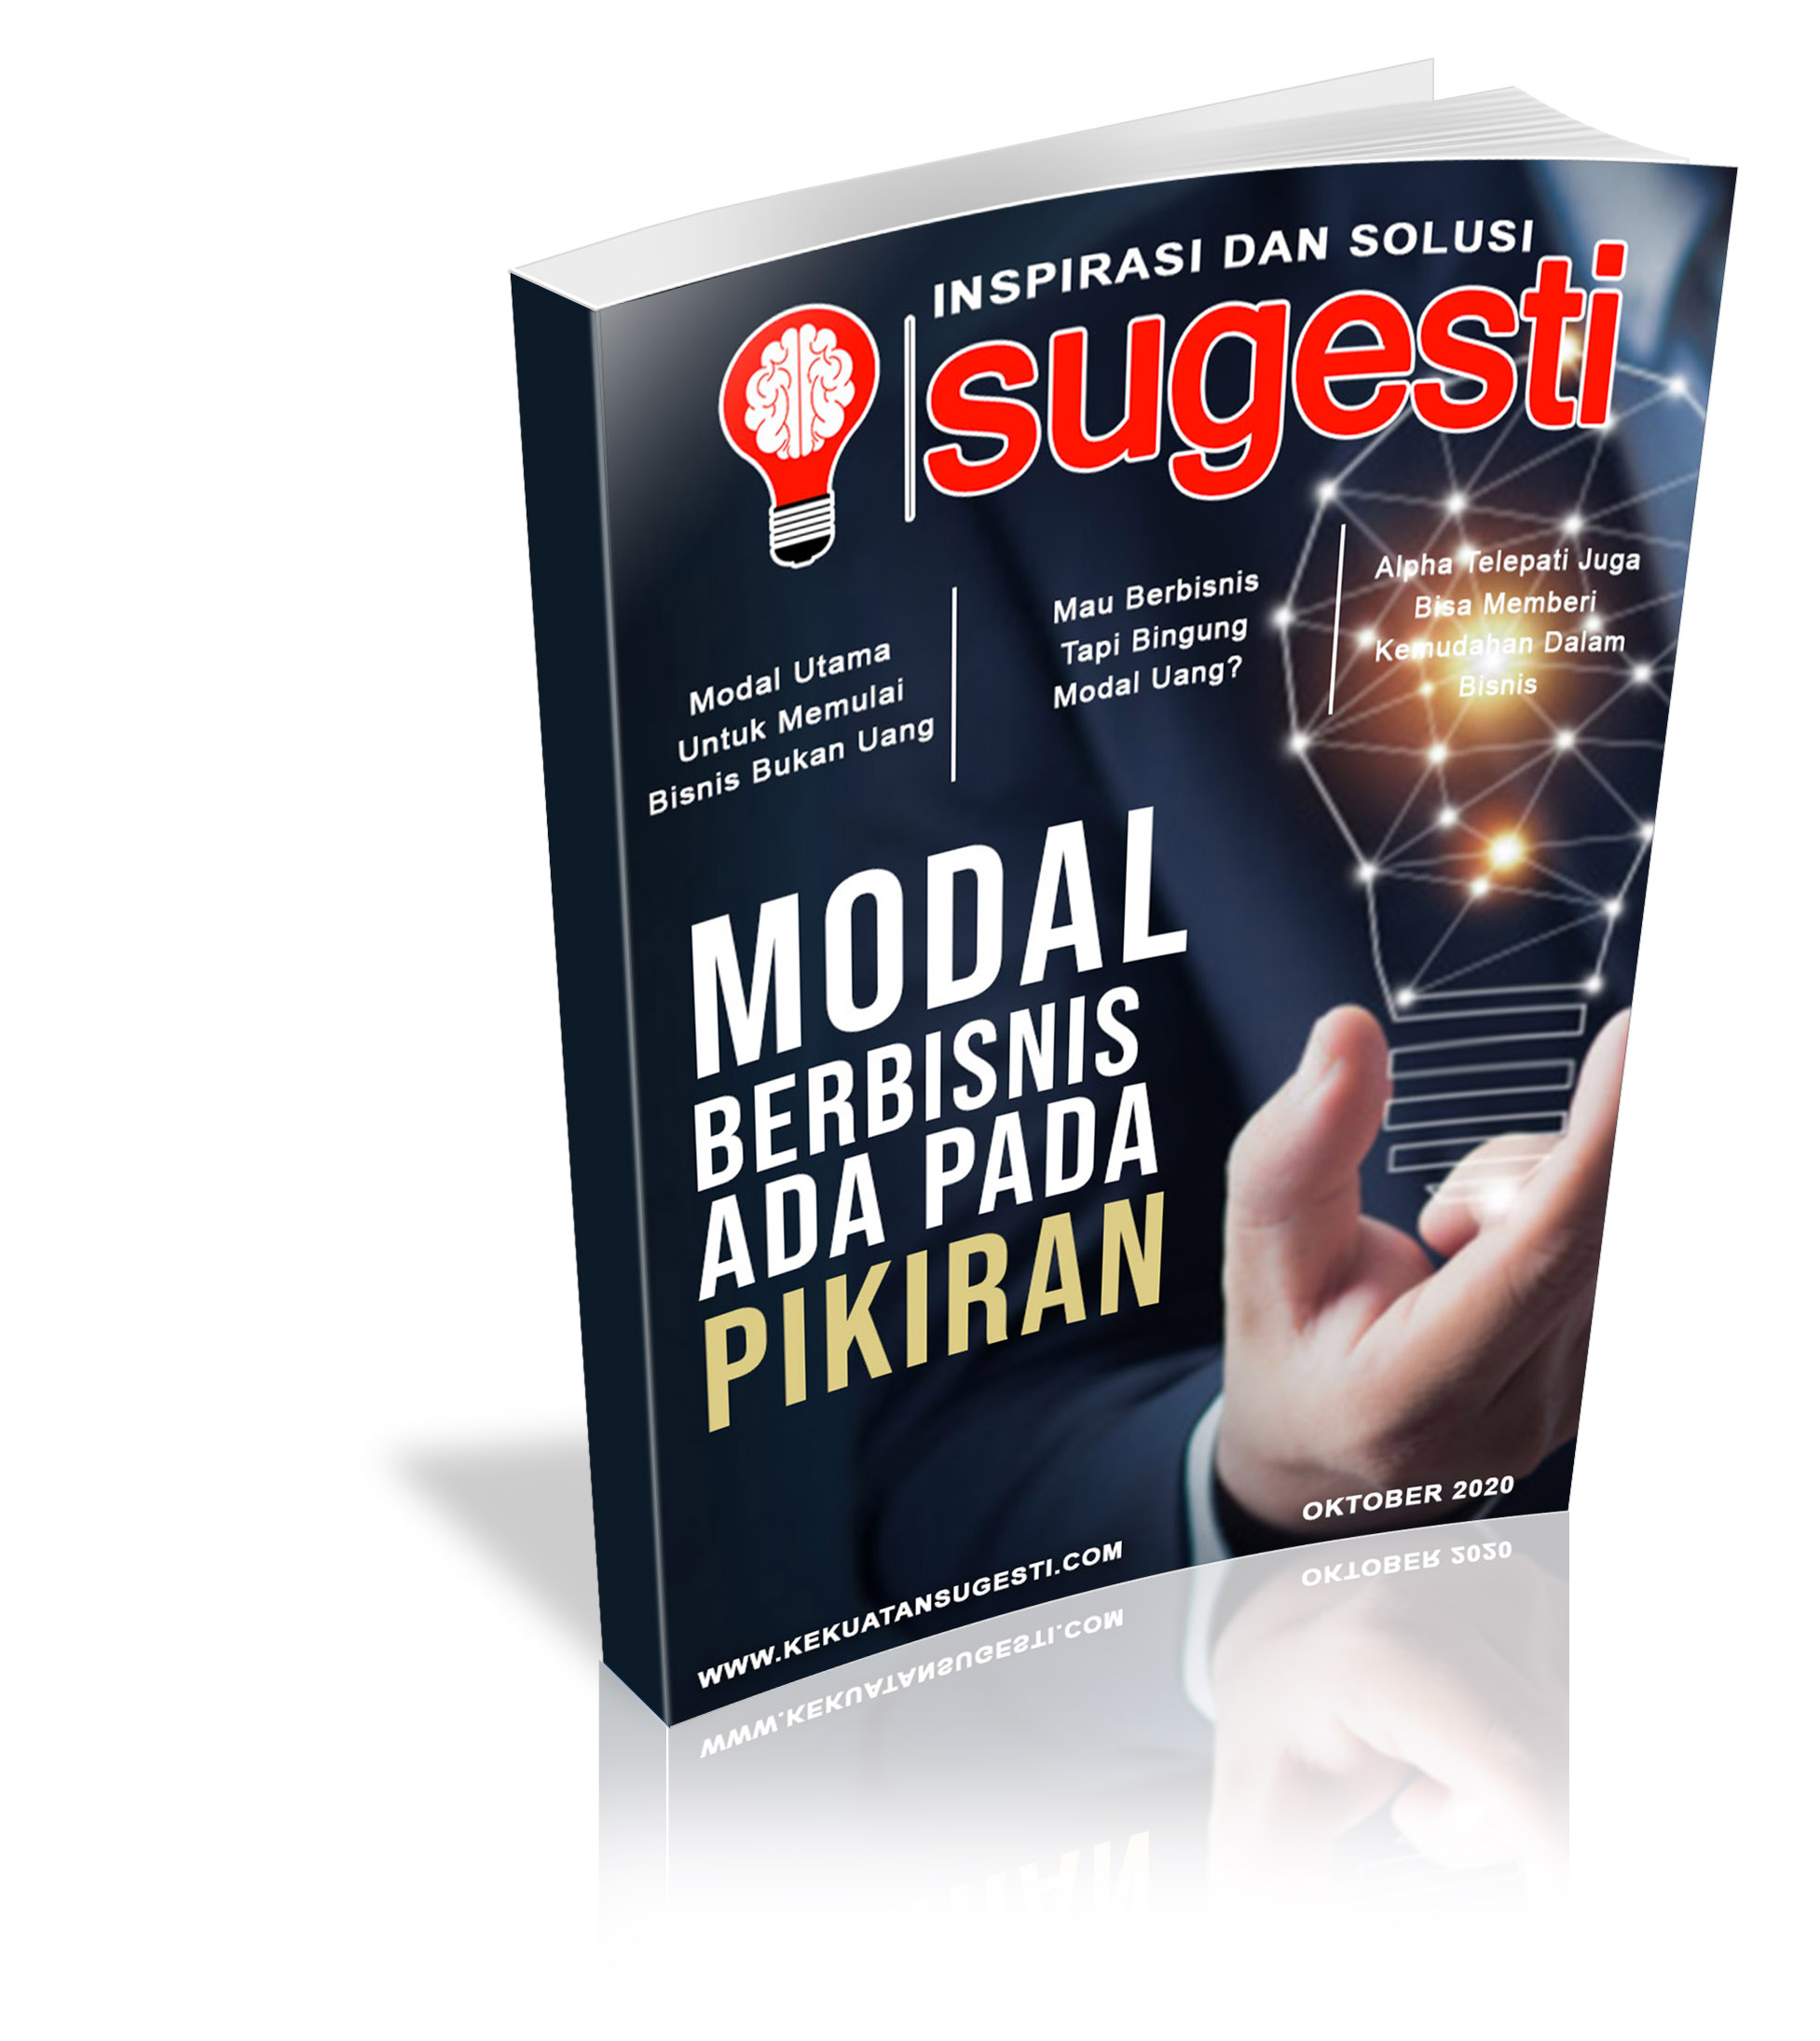 Majalah Sugesti Edisi Ke Tujuh Puluh Enam Bulan Oktober 2020